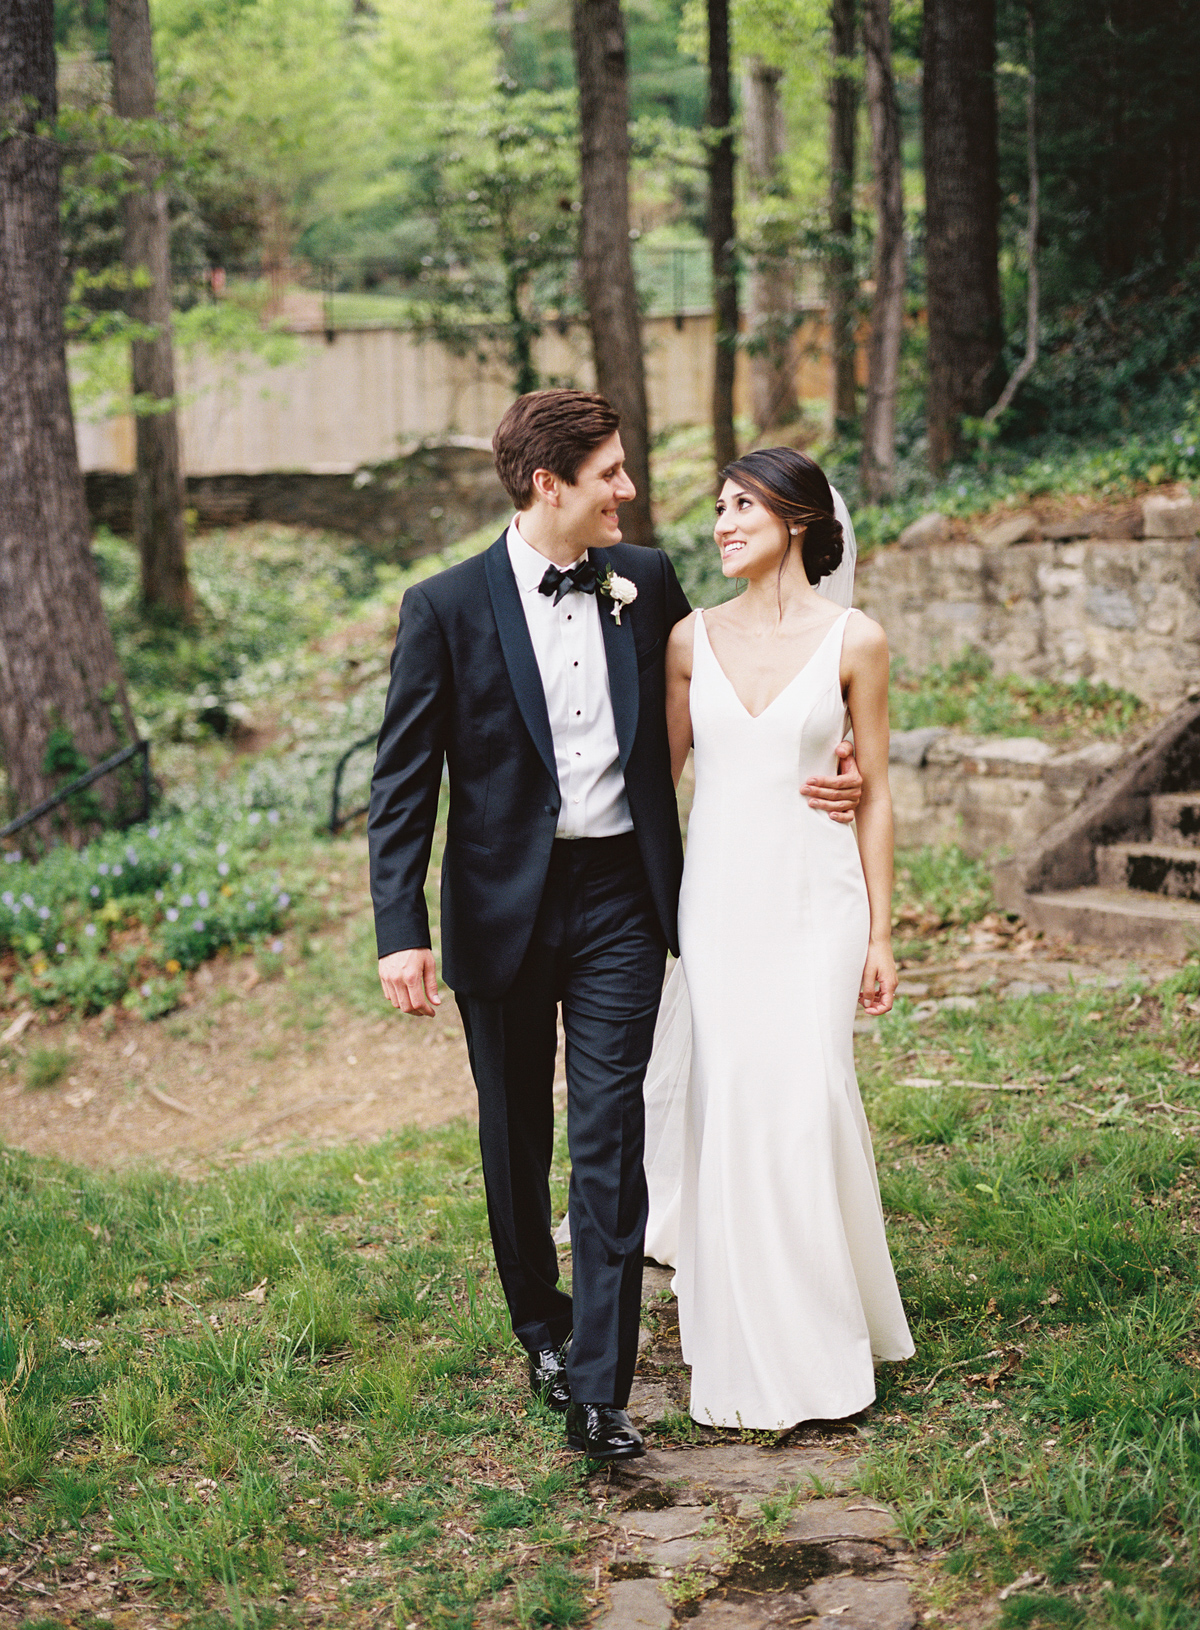 grove-park-inn-wedding-020.jpg